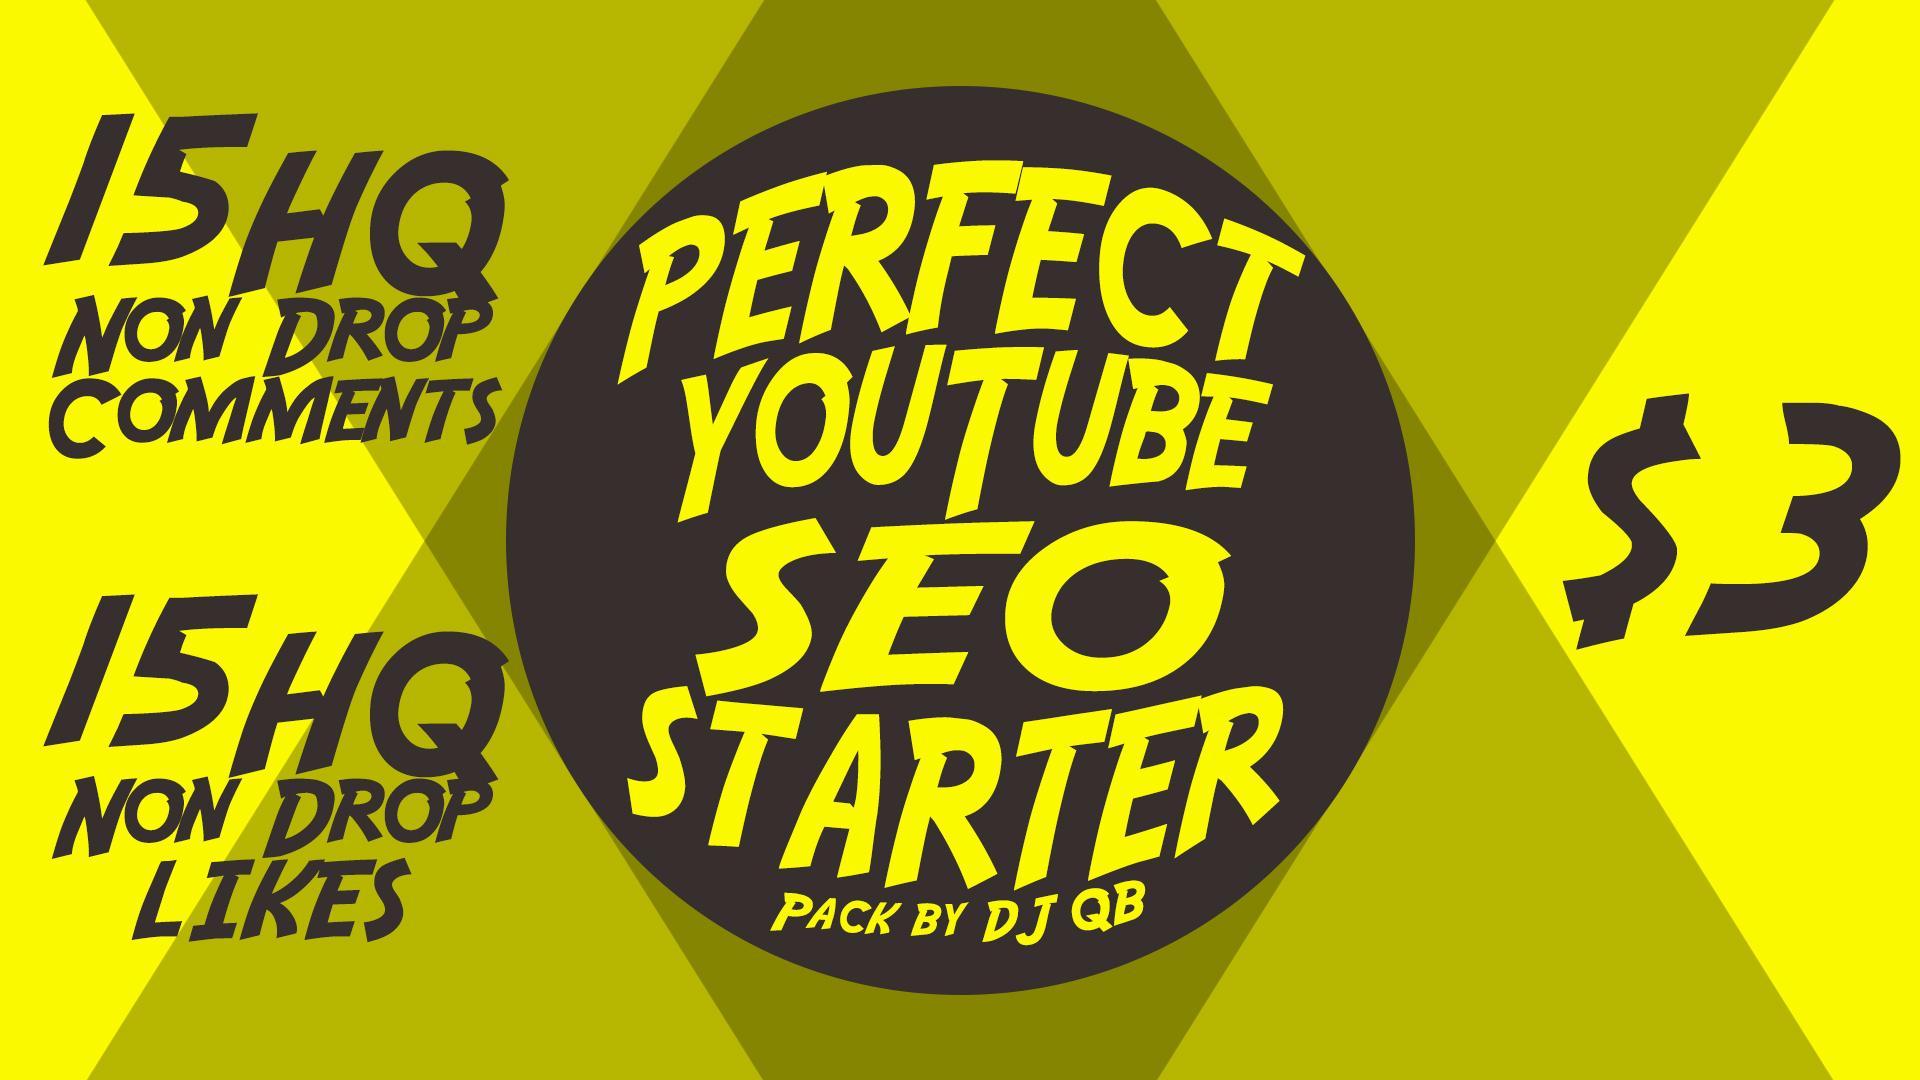 Perfect YouTube SEO